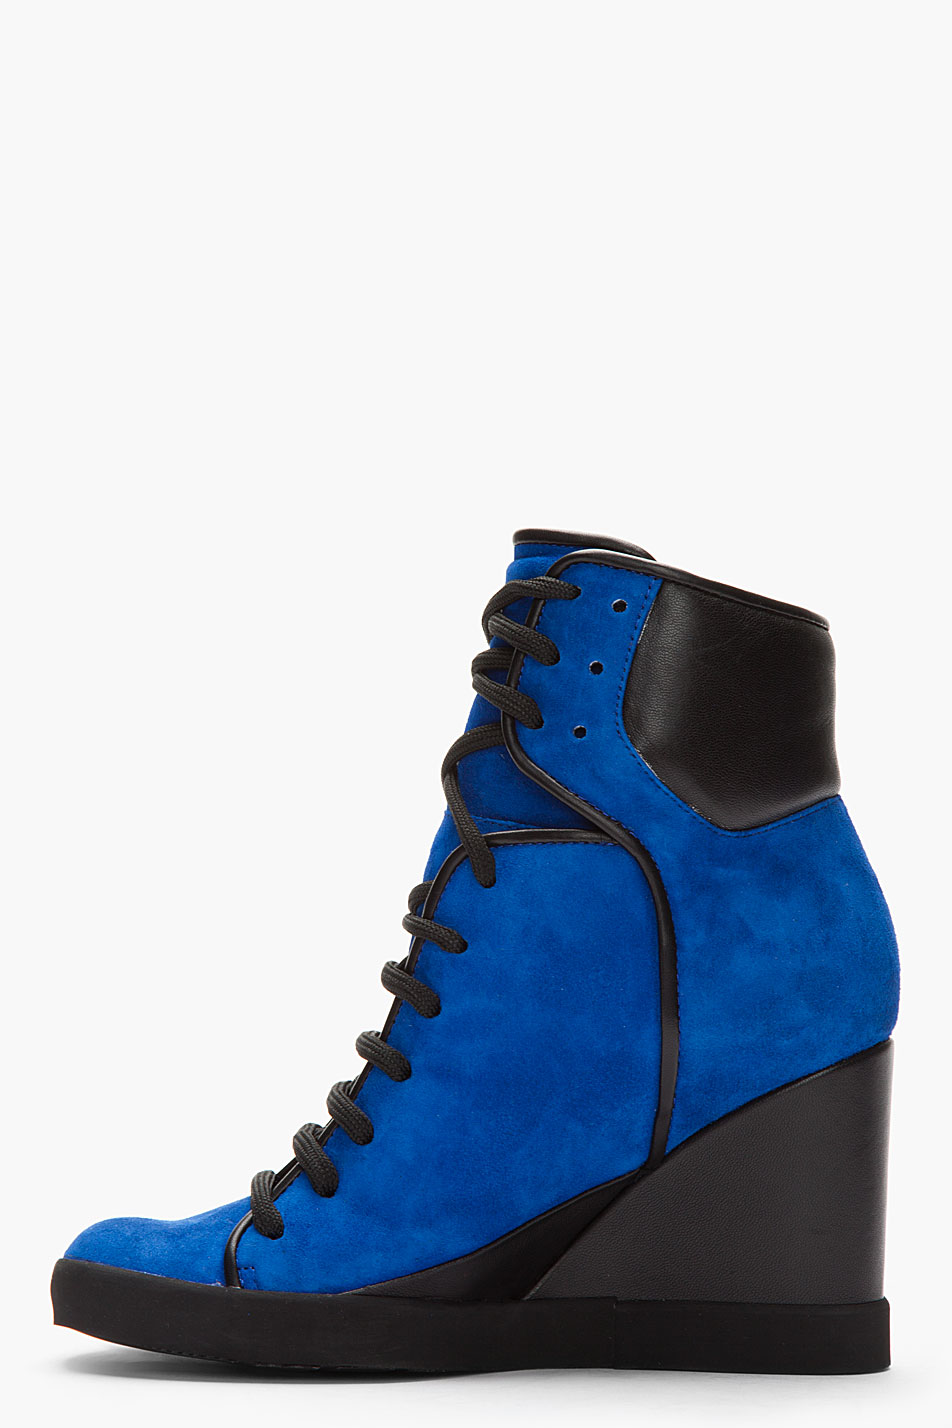 Dark Royal Blue High Heel Shoes  searscom